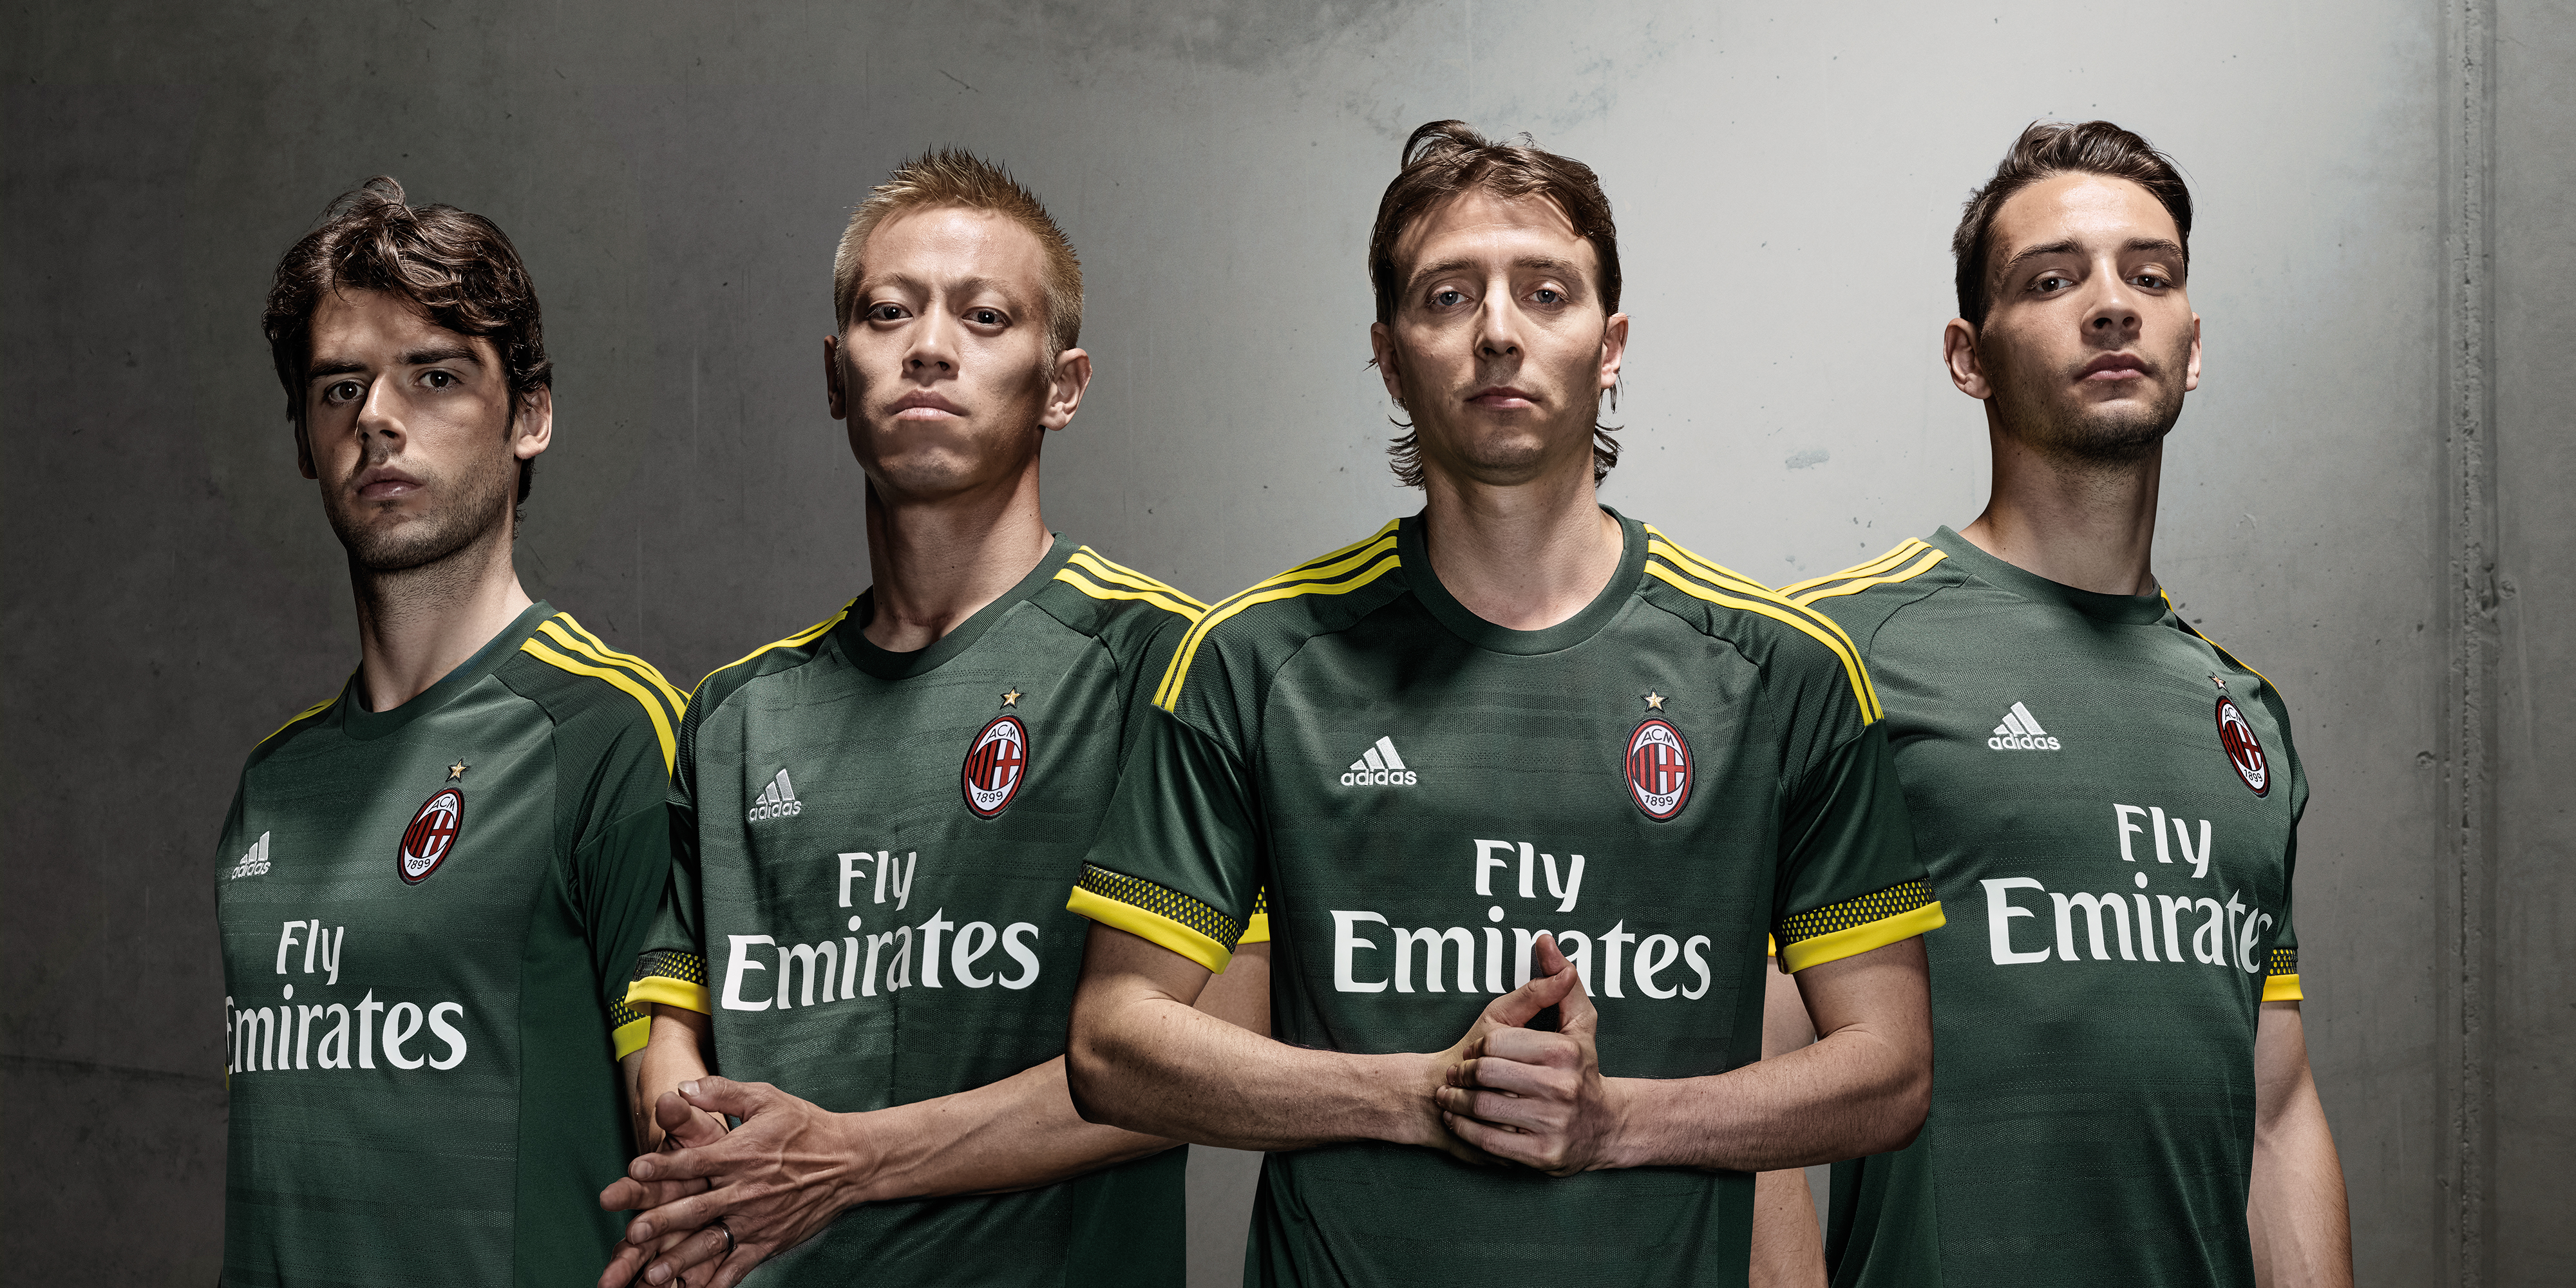 Le maillot Third du Milan AC 2015-16